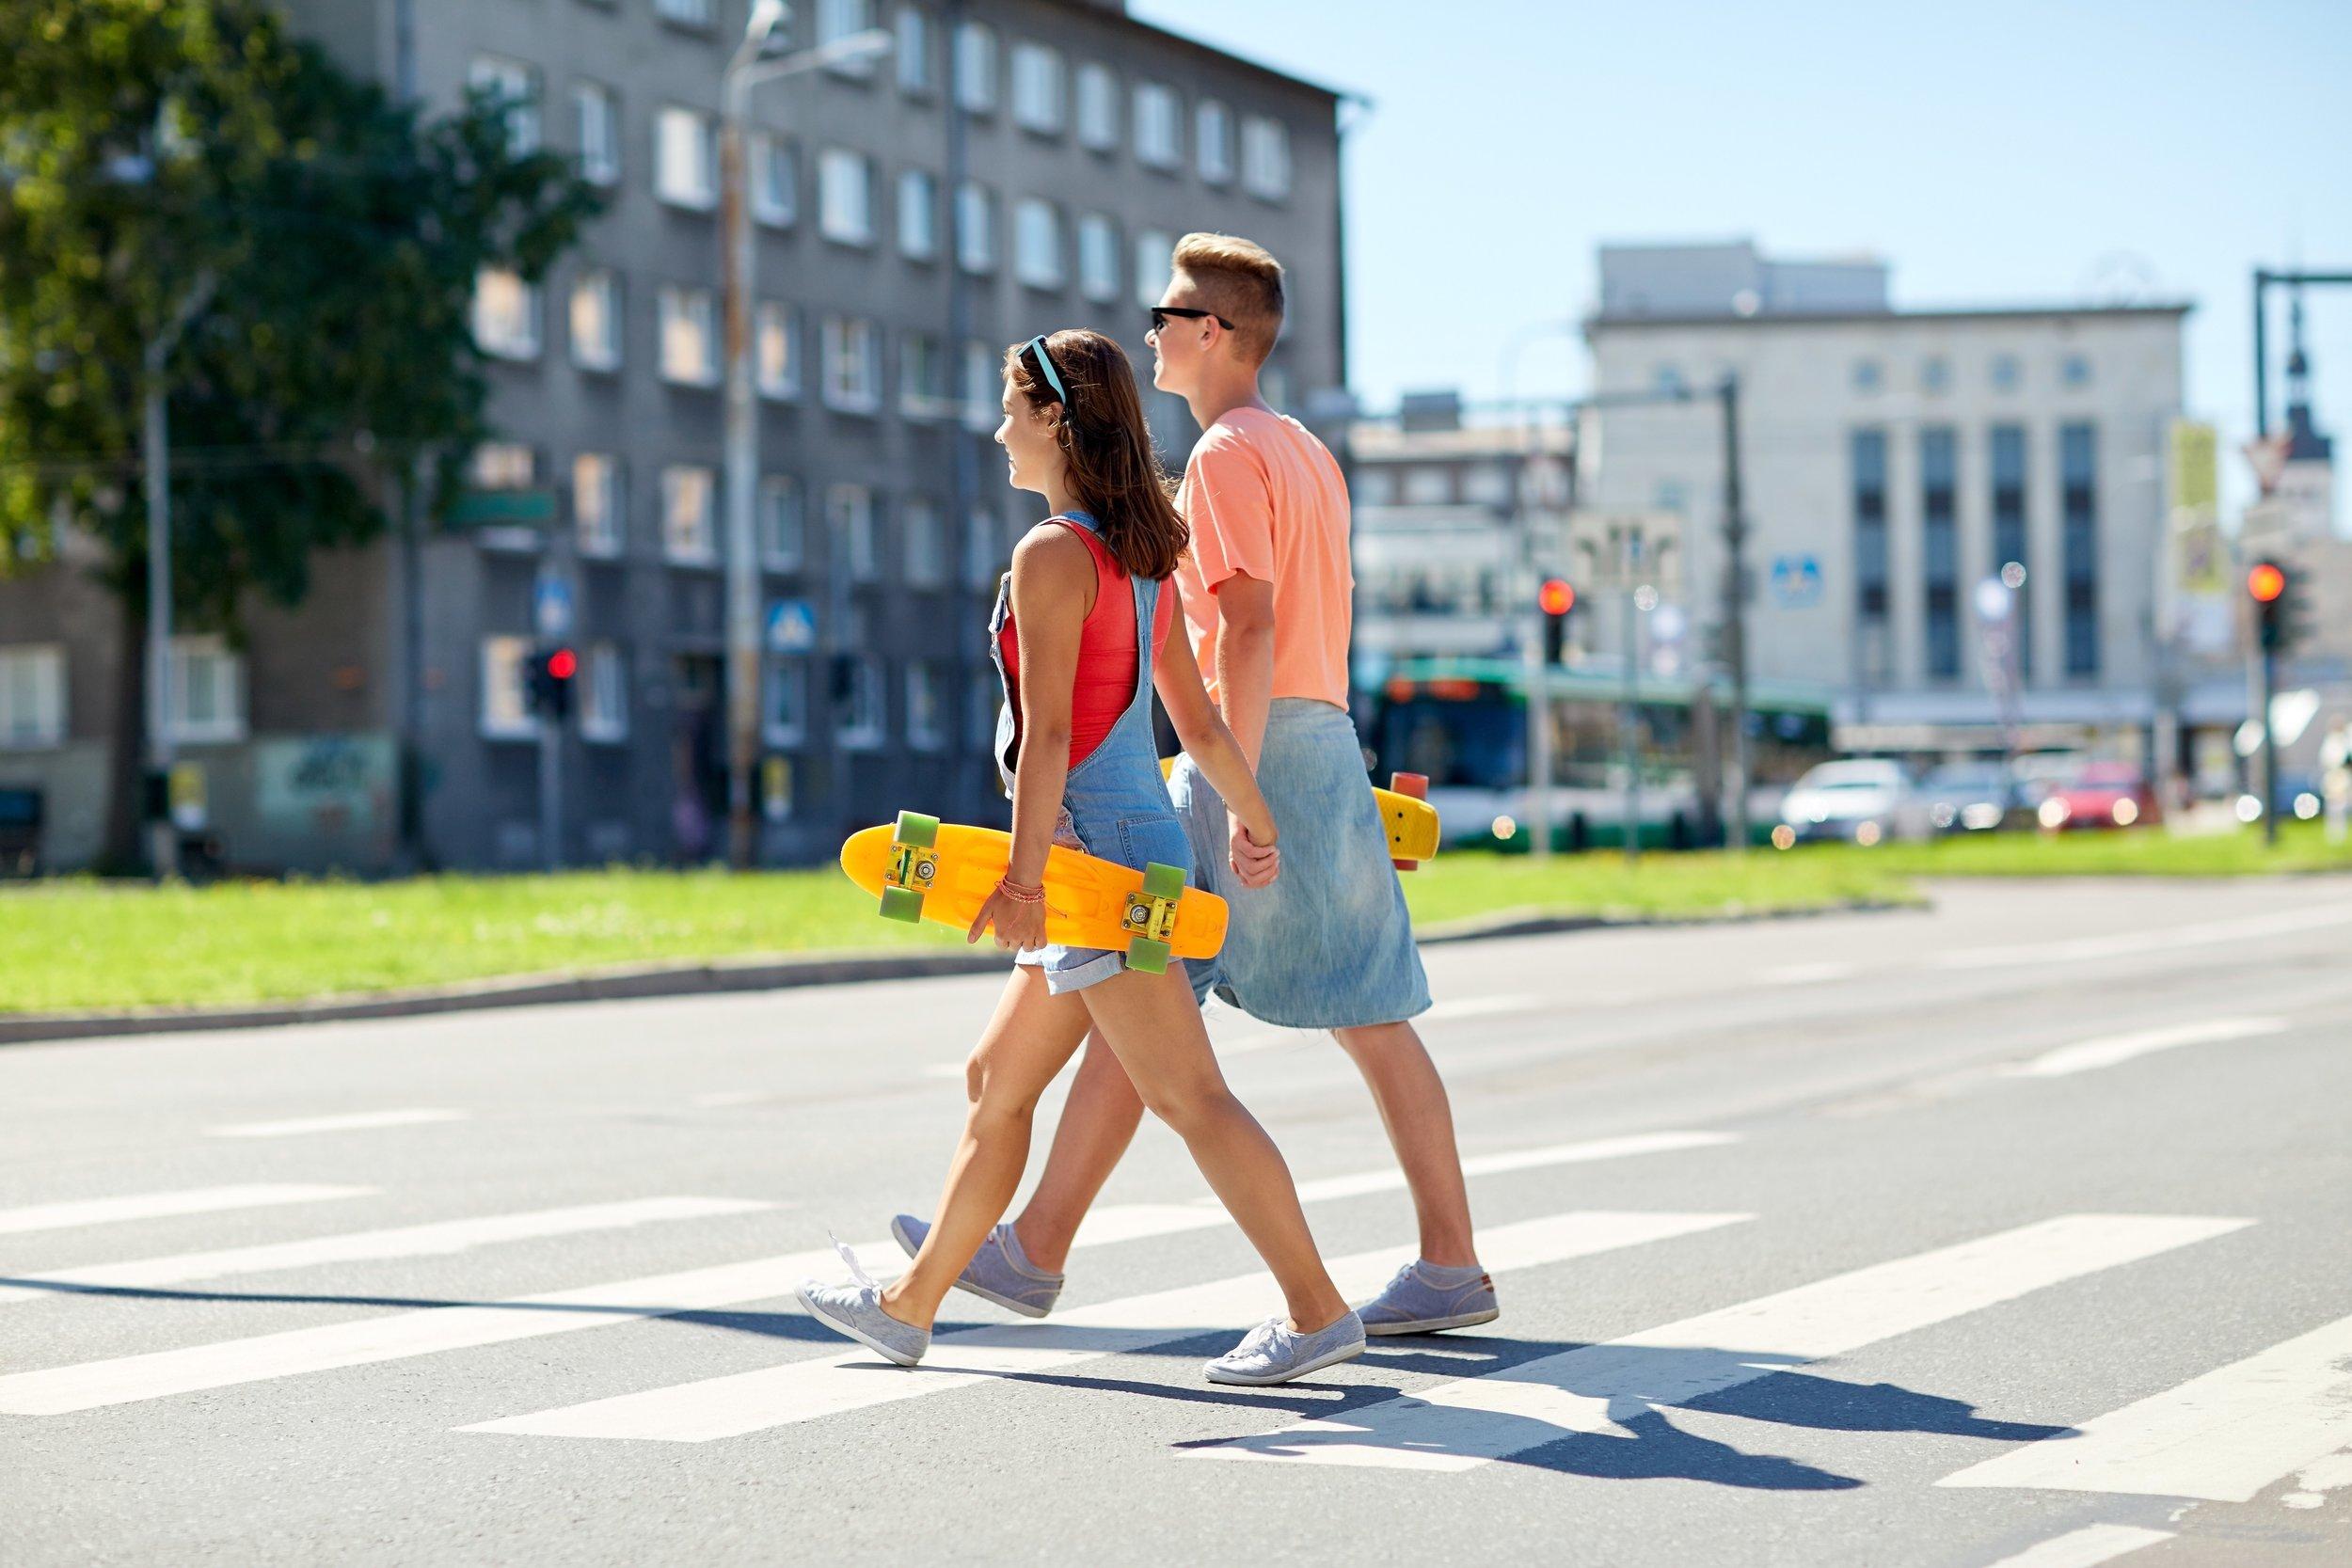 teenage-couple-with-skateboards-on-city-crosswalk-PK5XTU3.jpg